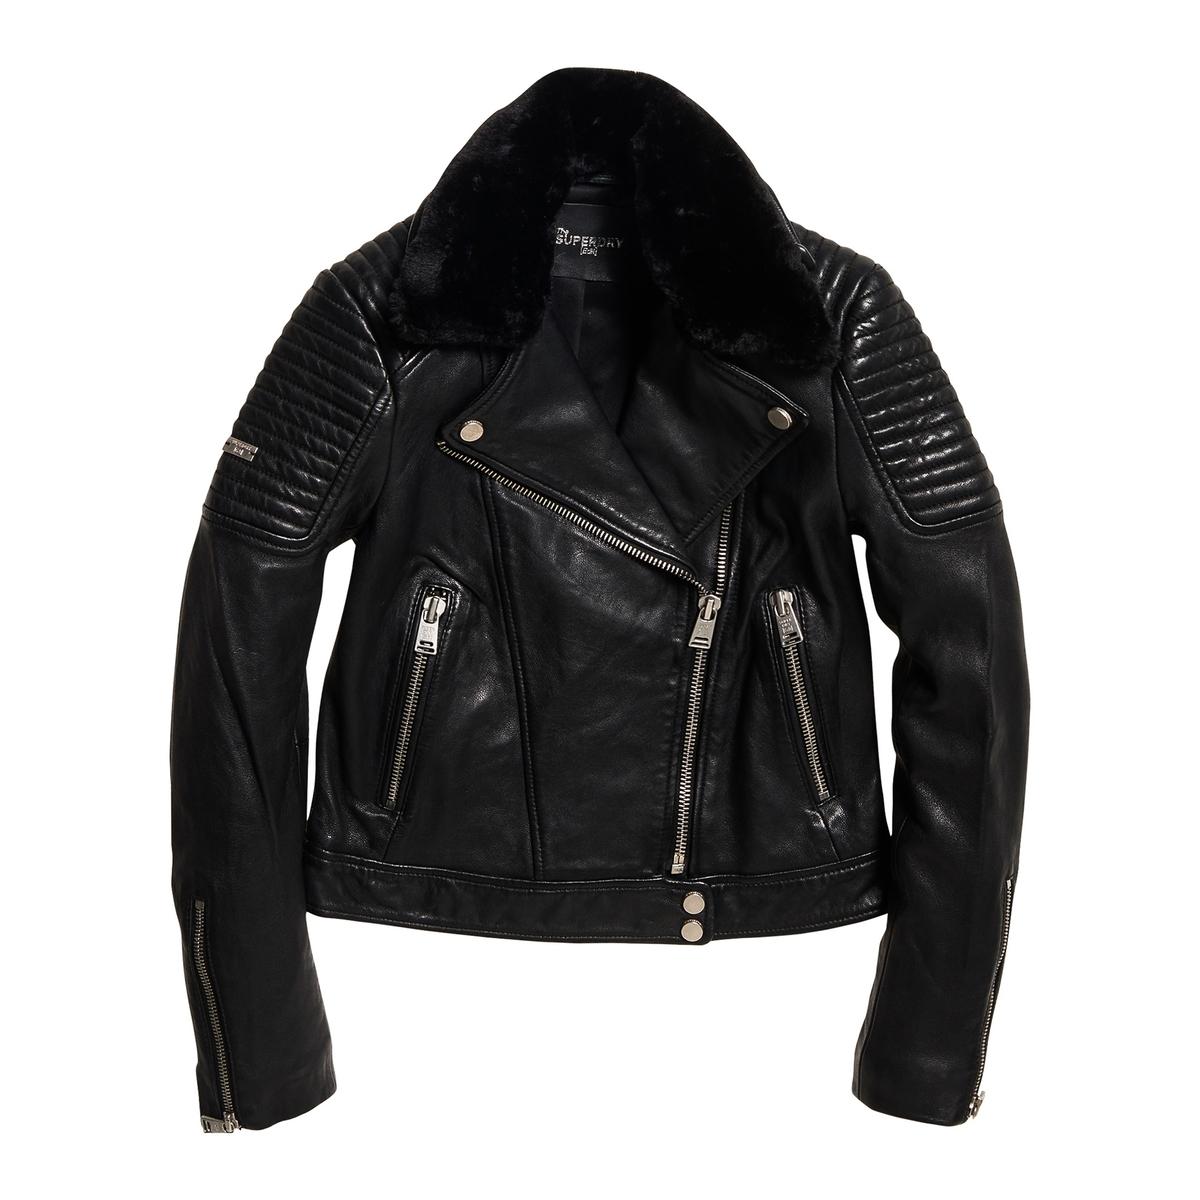 Chaqueta de piel con cuello forrado Premium Winter Leather Biker